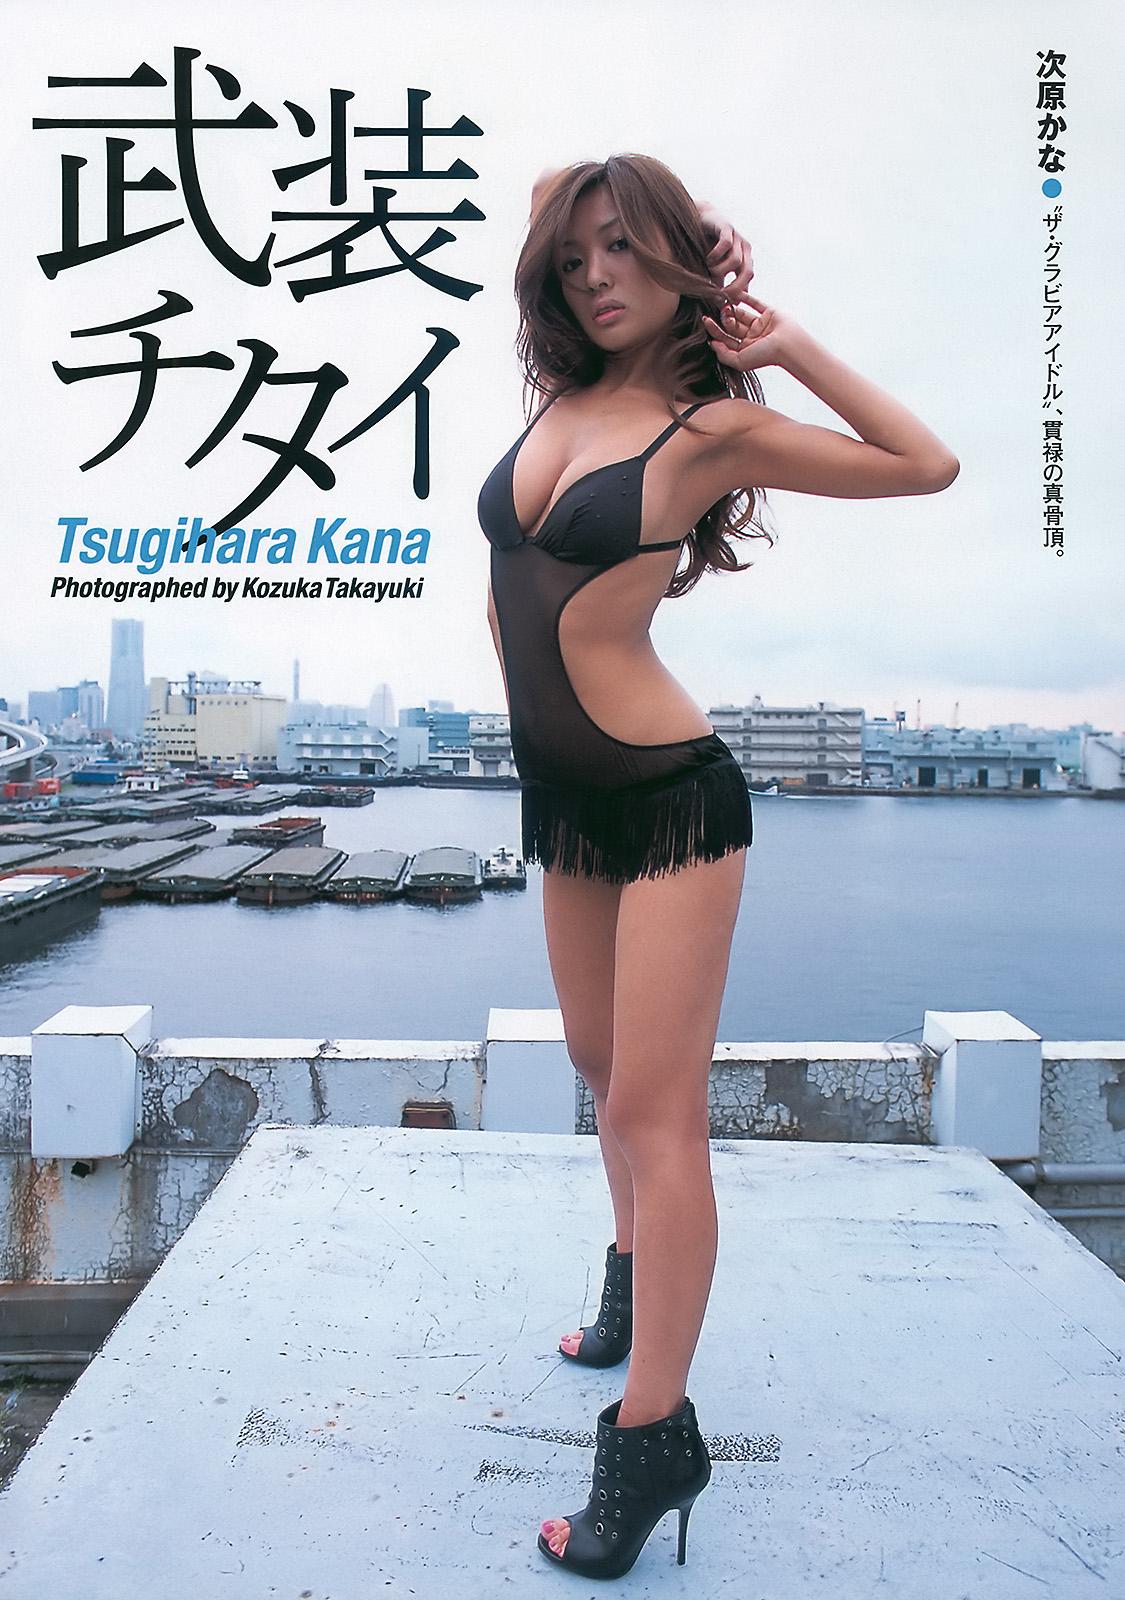 Kana Tsugihara Kana Tsugihara new photo